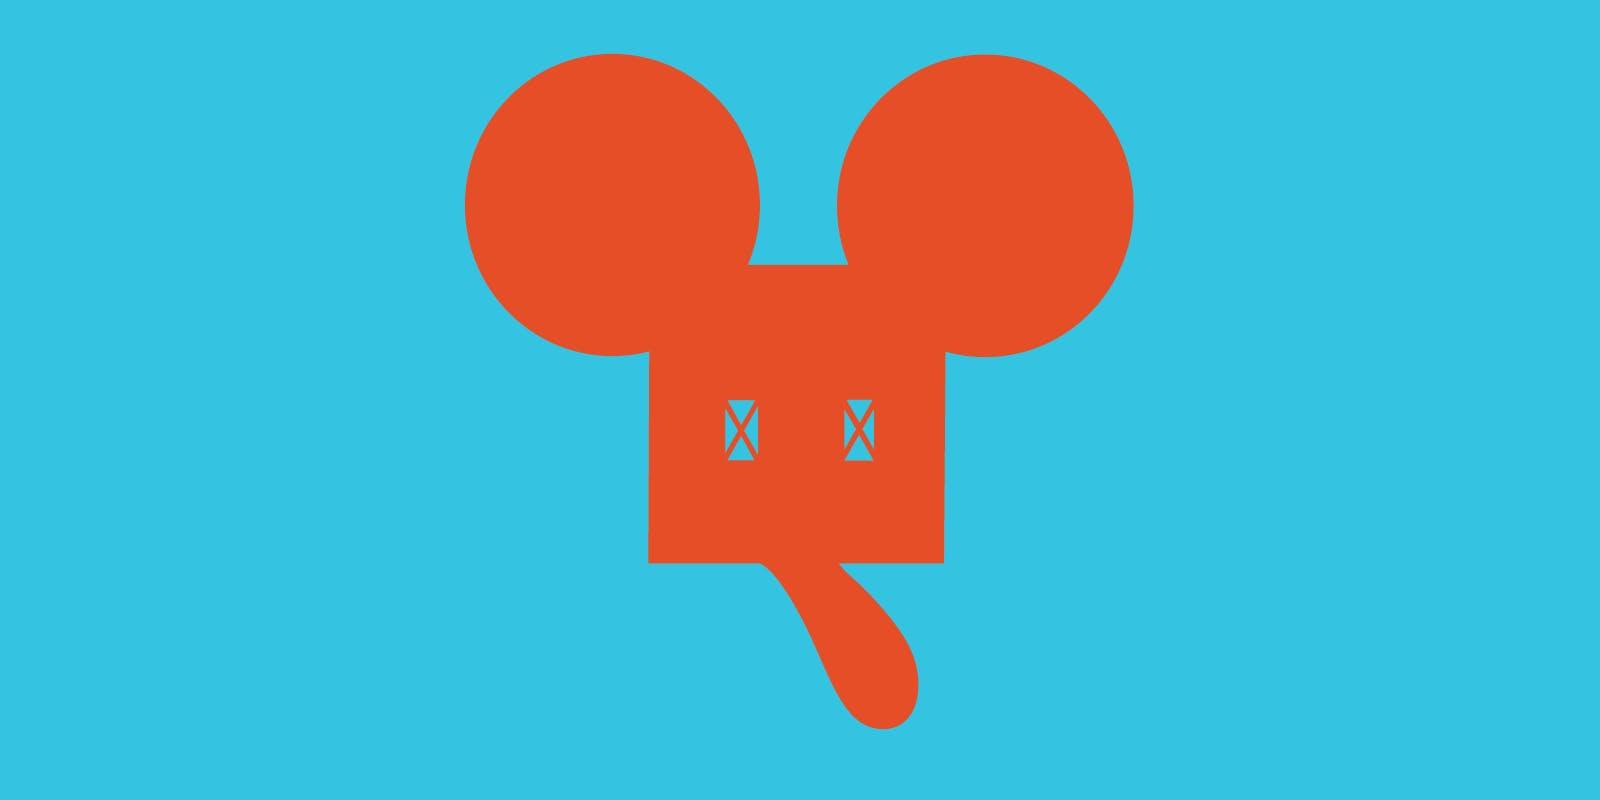 Claes Oldenburg, Geometric Mouse Logo—Unconscious State